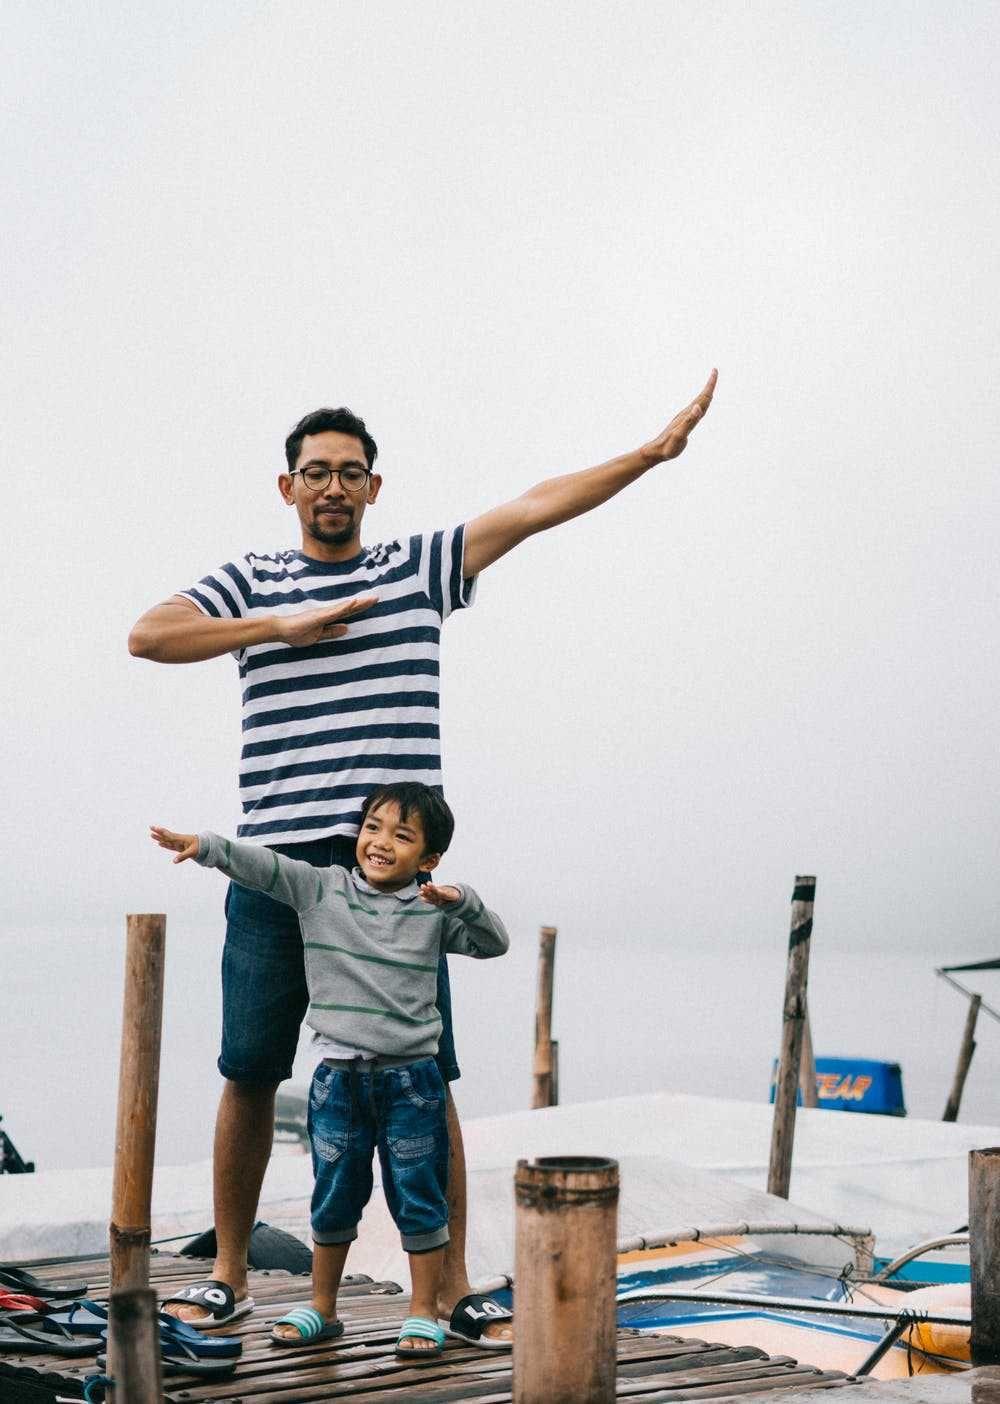 10 Kosakata Tentang Keluarga dalam Bahasa Makassar, Nuasseng Ji?